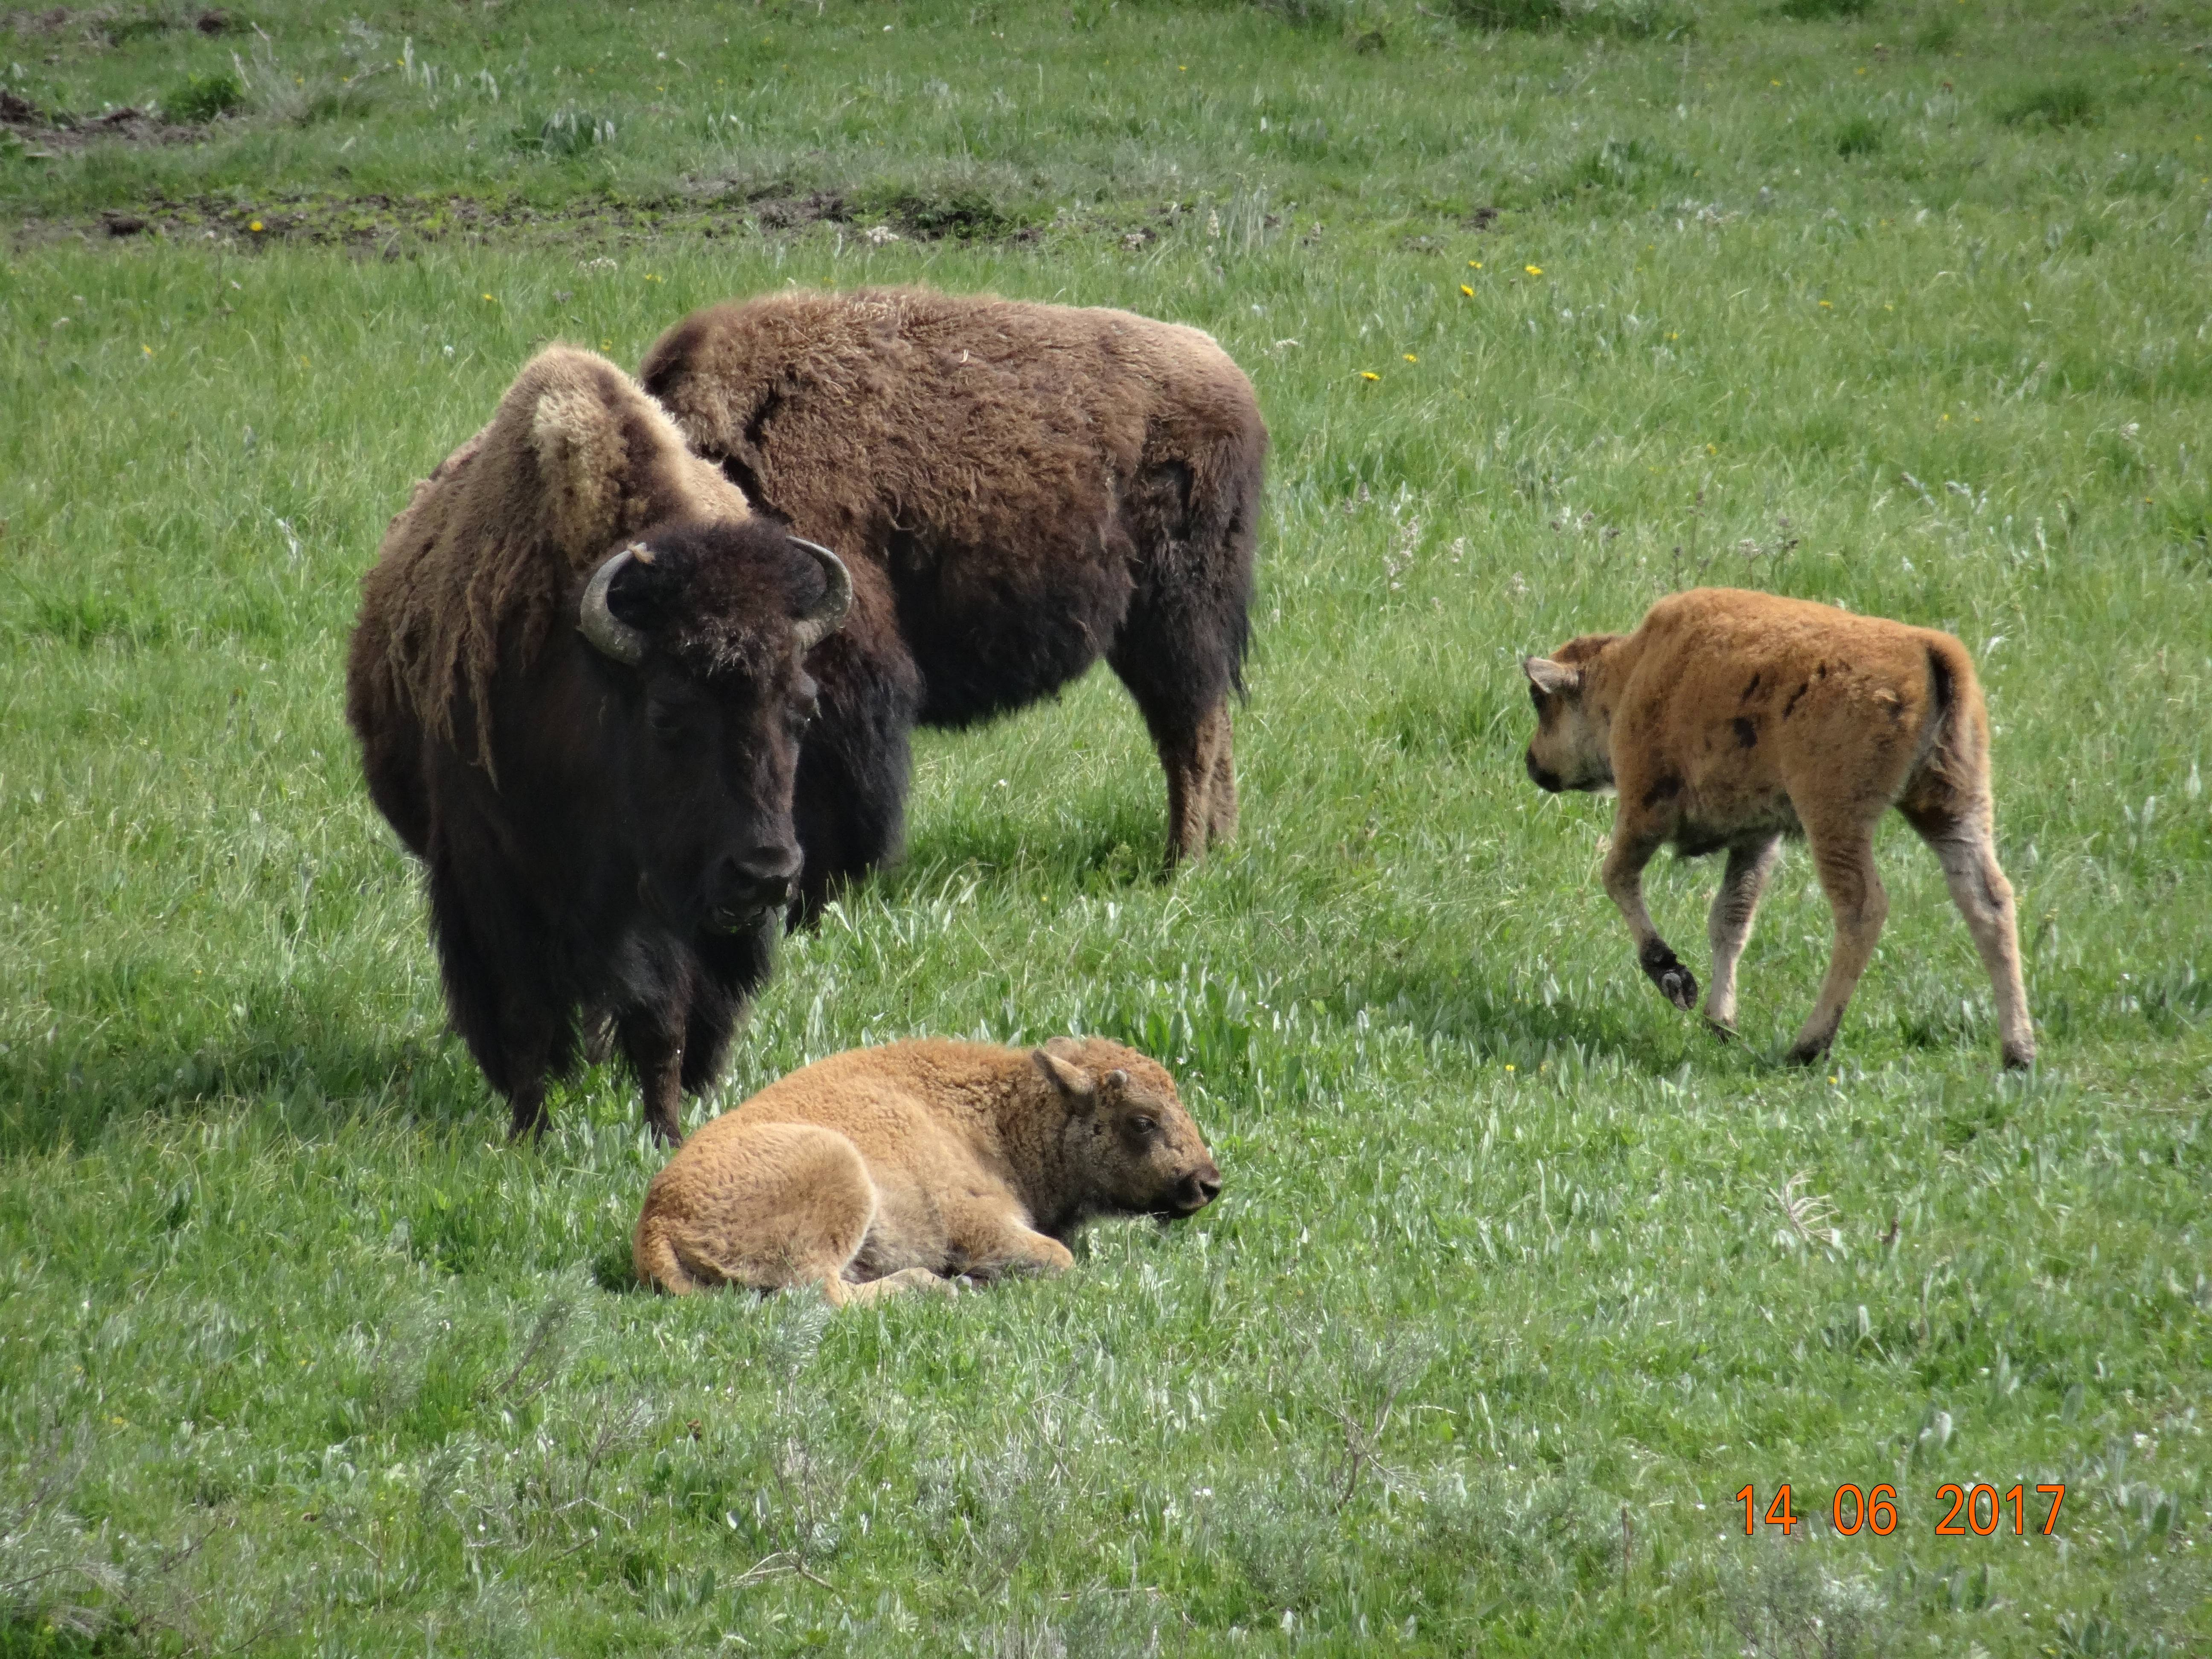 Photo 2: Yellowstone, quel parc merveilleux....